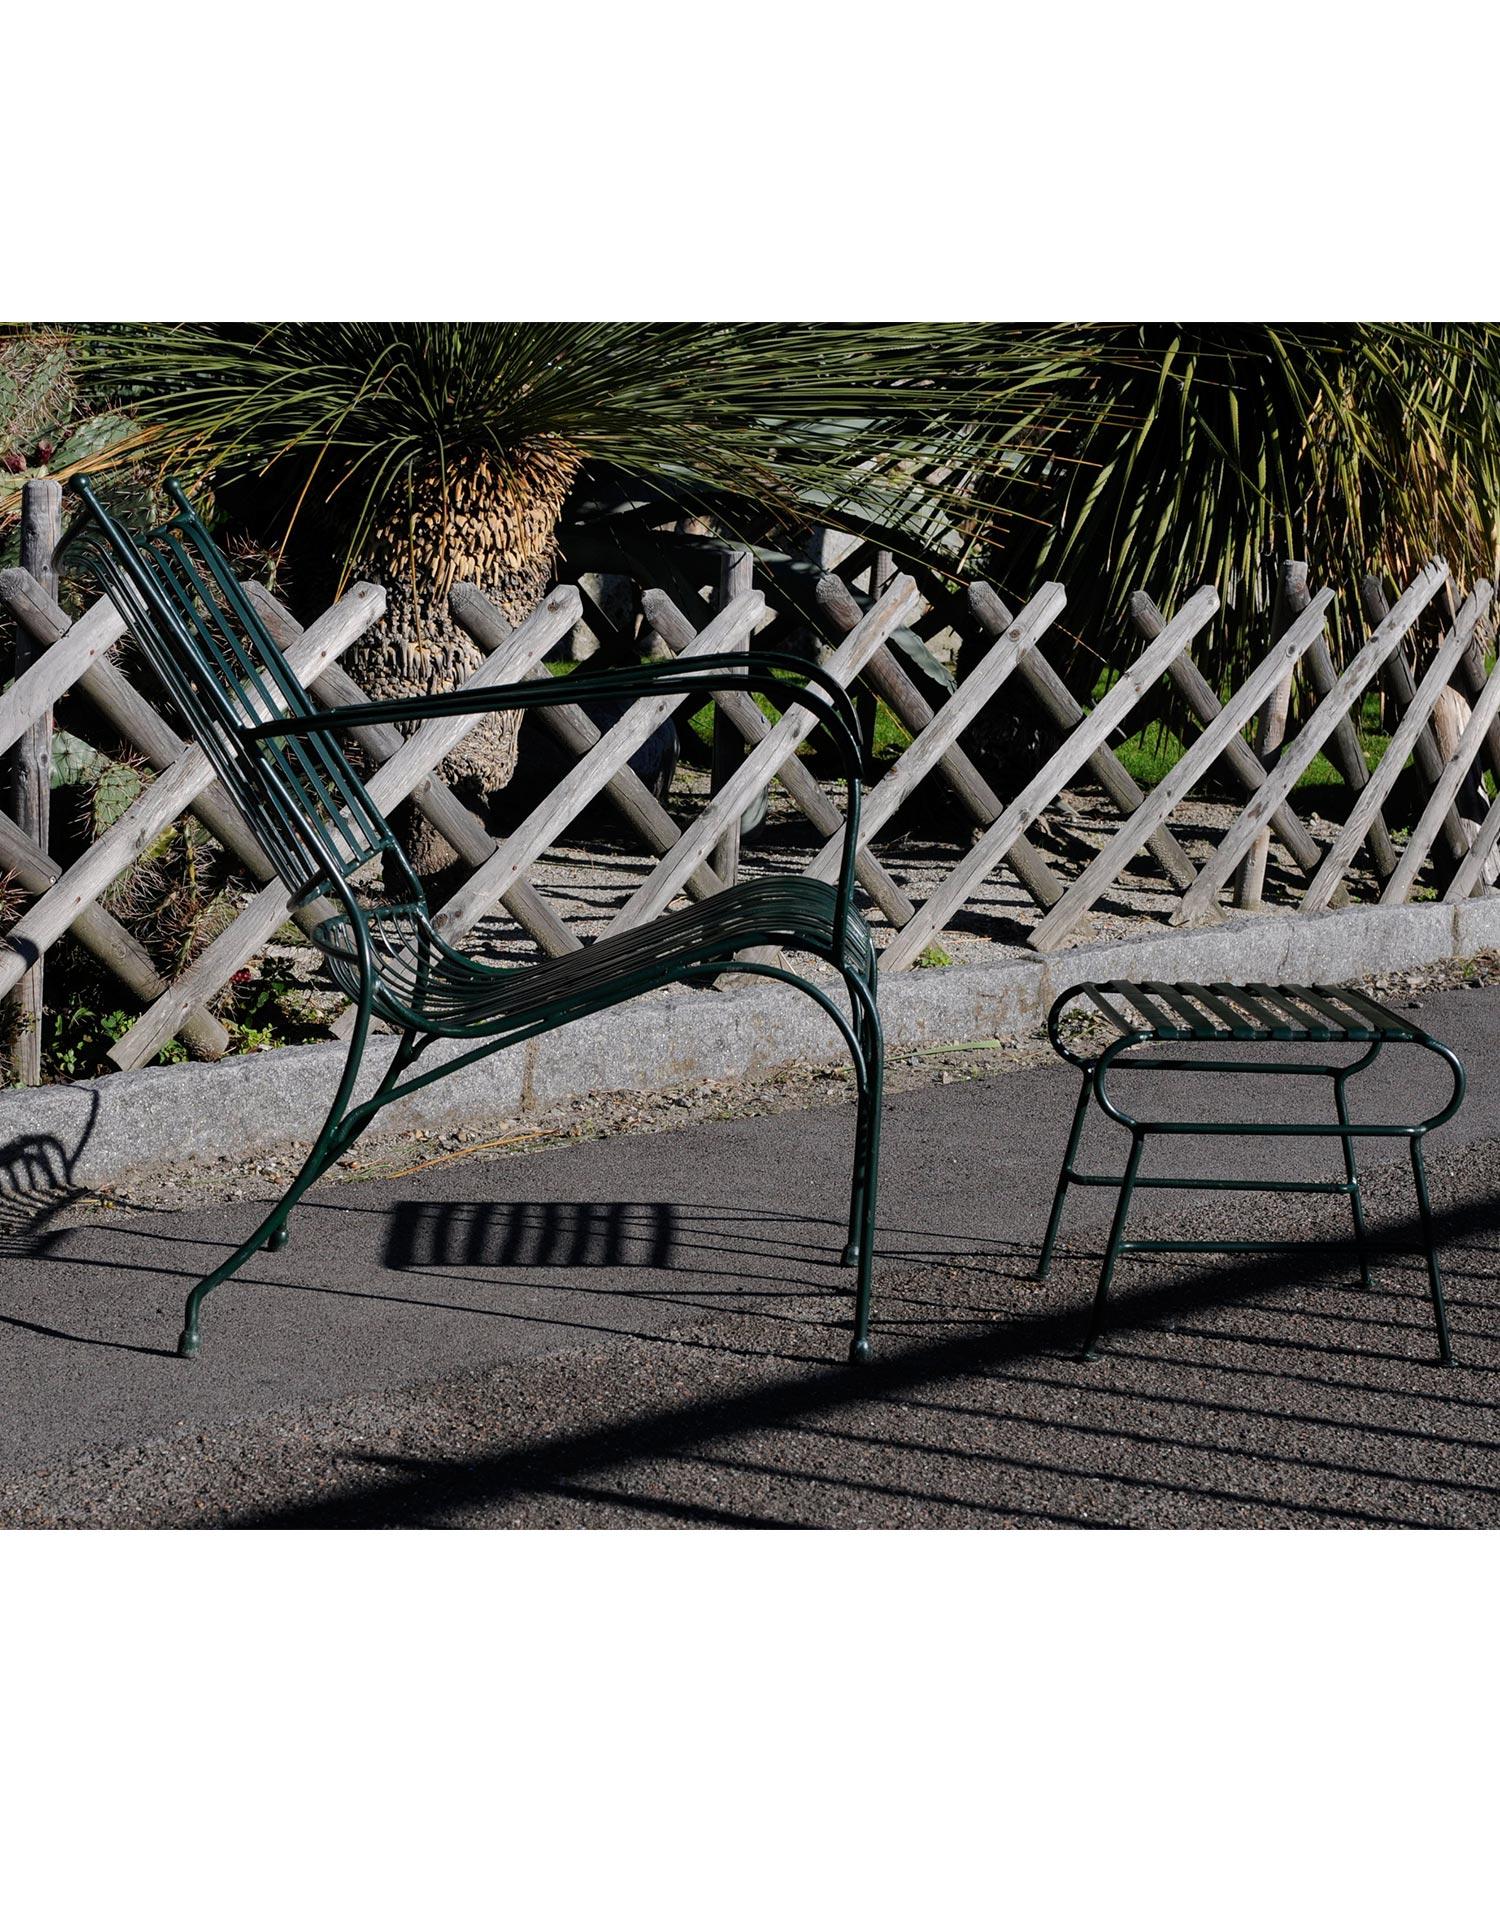 Gartenmoebel aus Eisen  Beausoleil Sessel  teaklandch